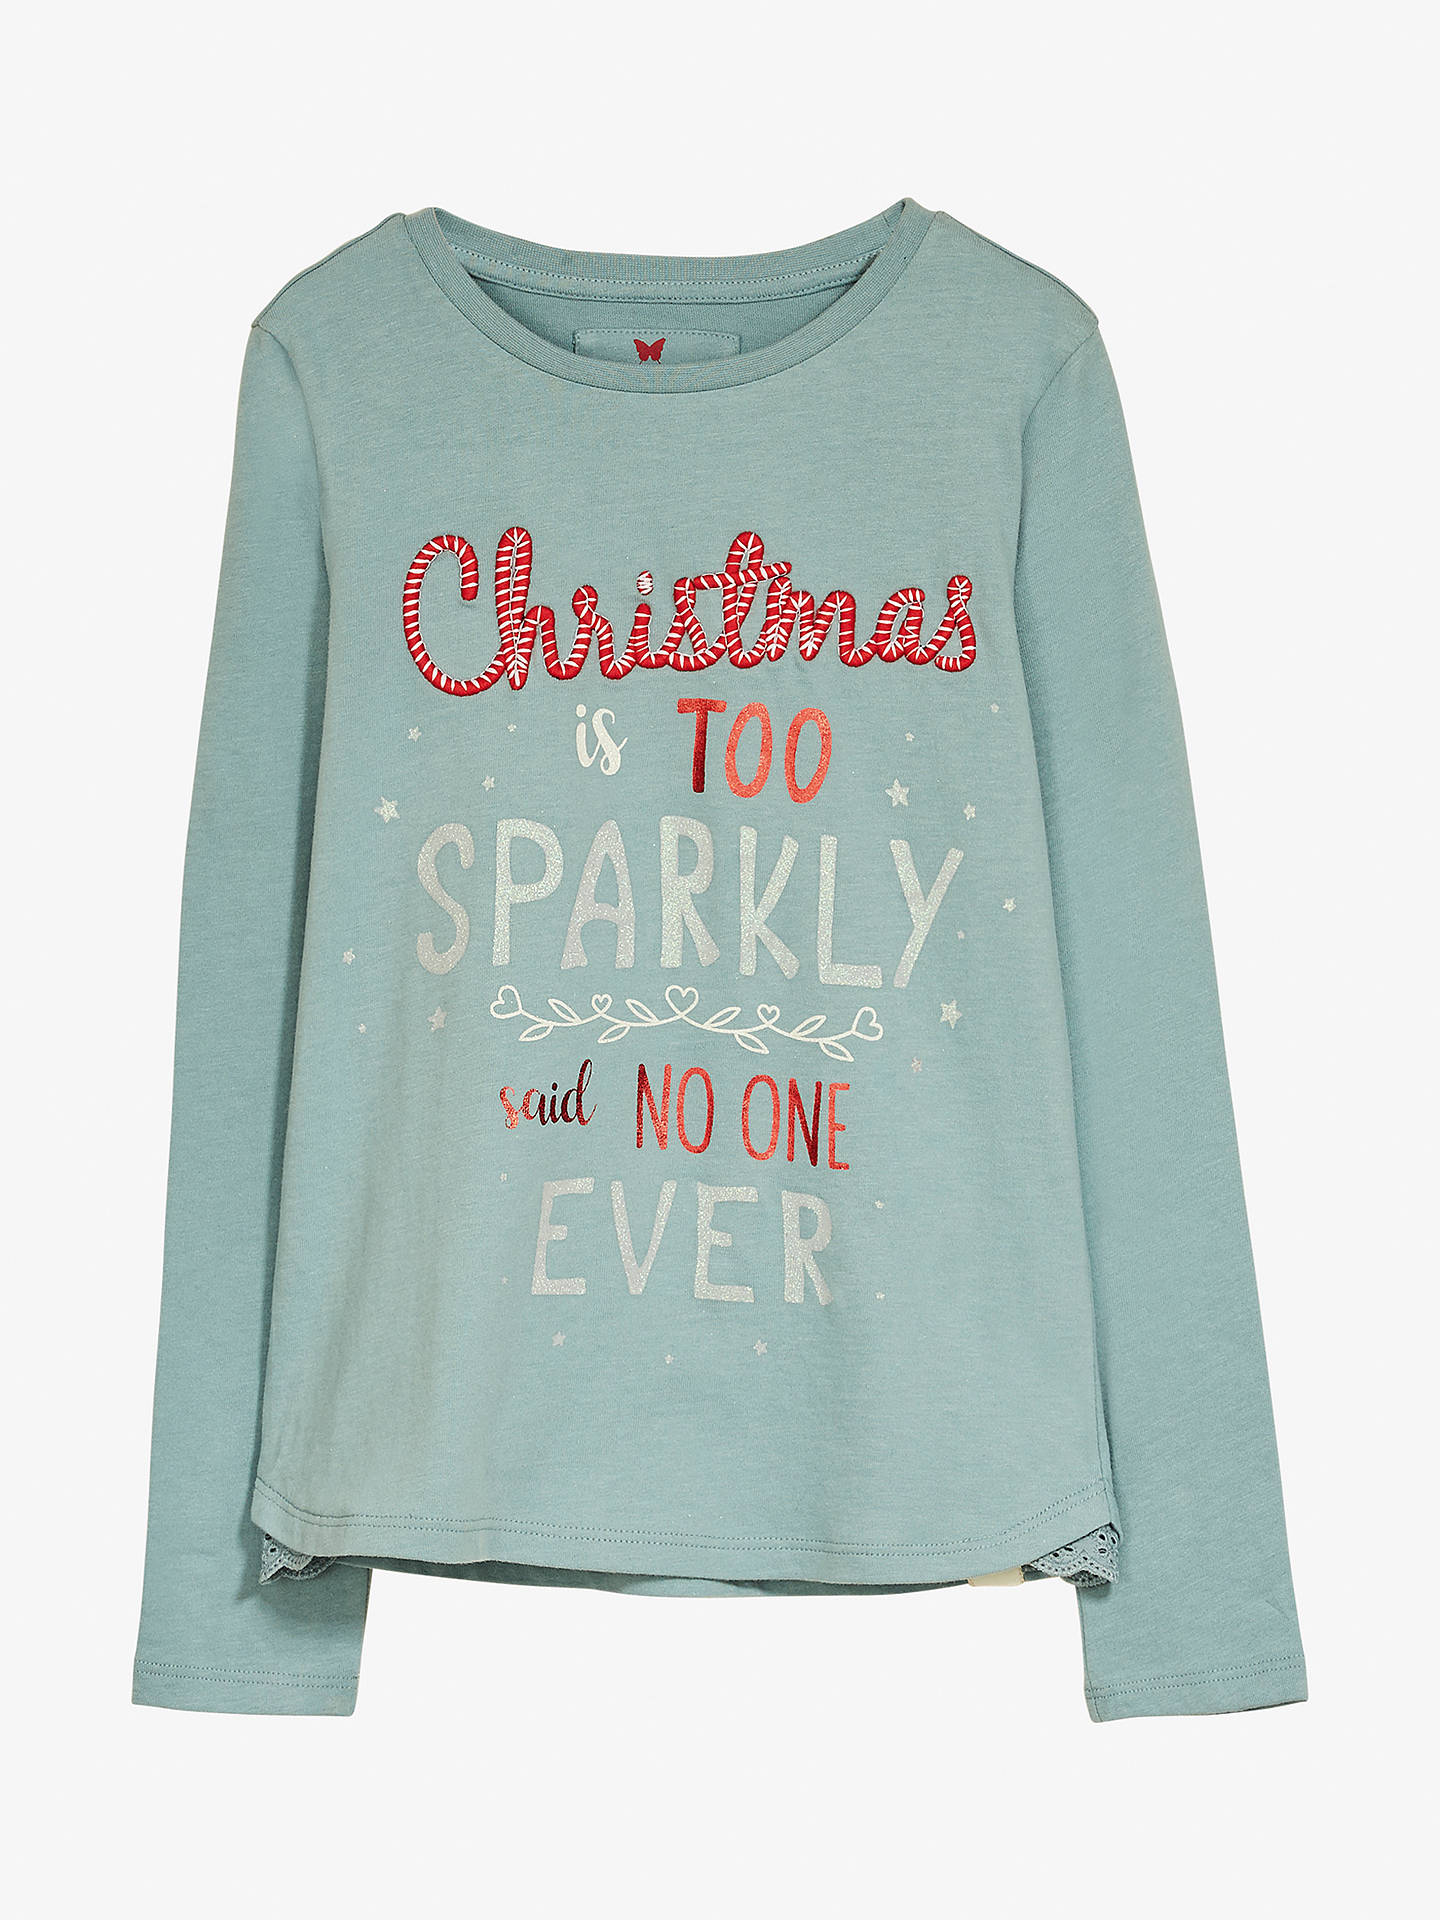 3773ce6e Fat Face Girls' Christmas Slogan T-Shirt, Aqua at John Lewis & Partners